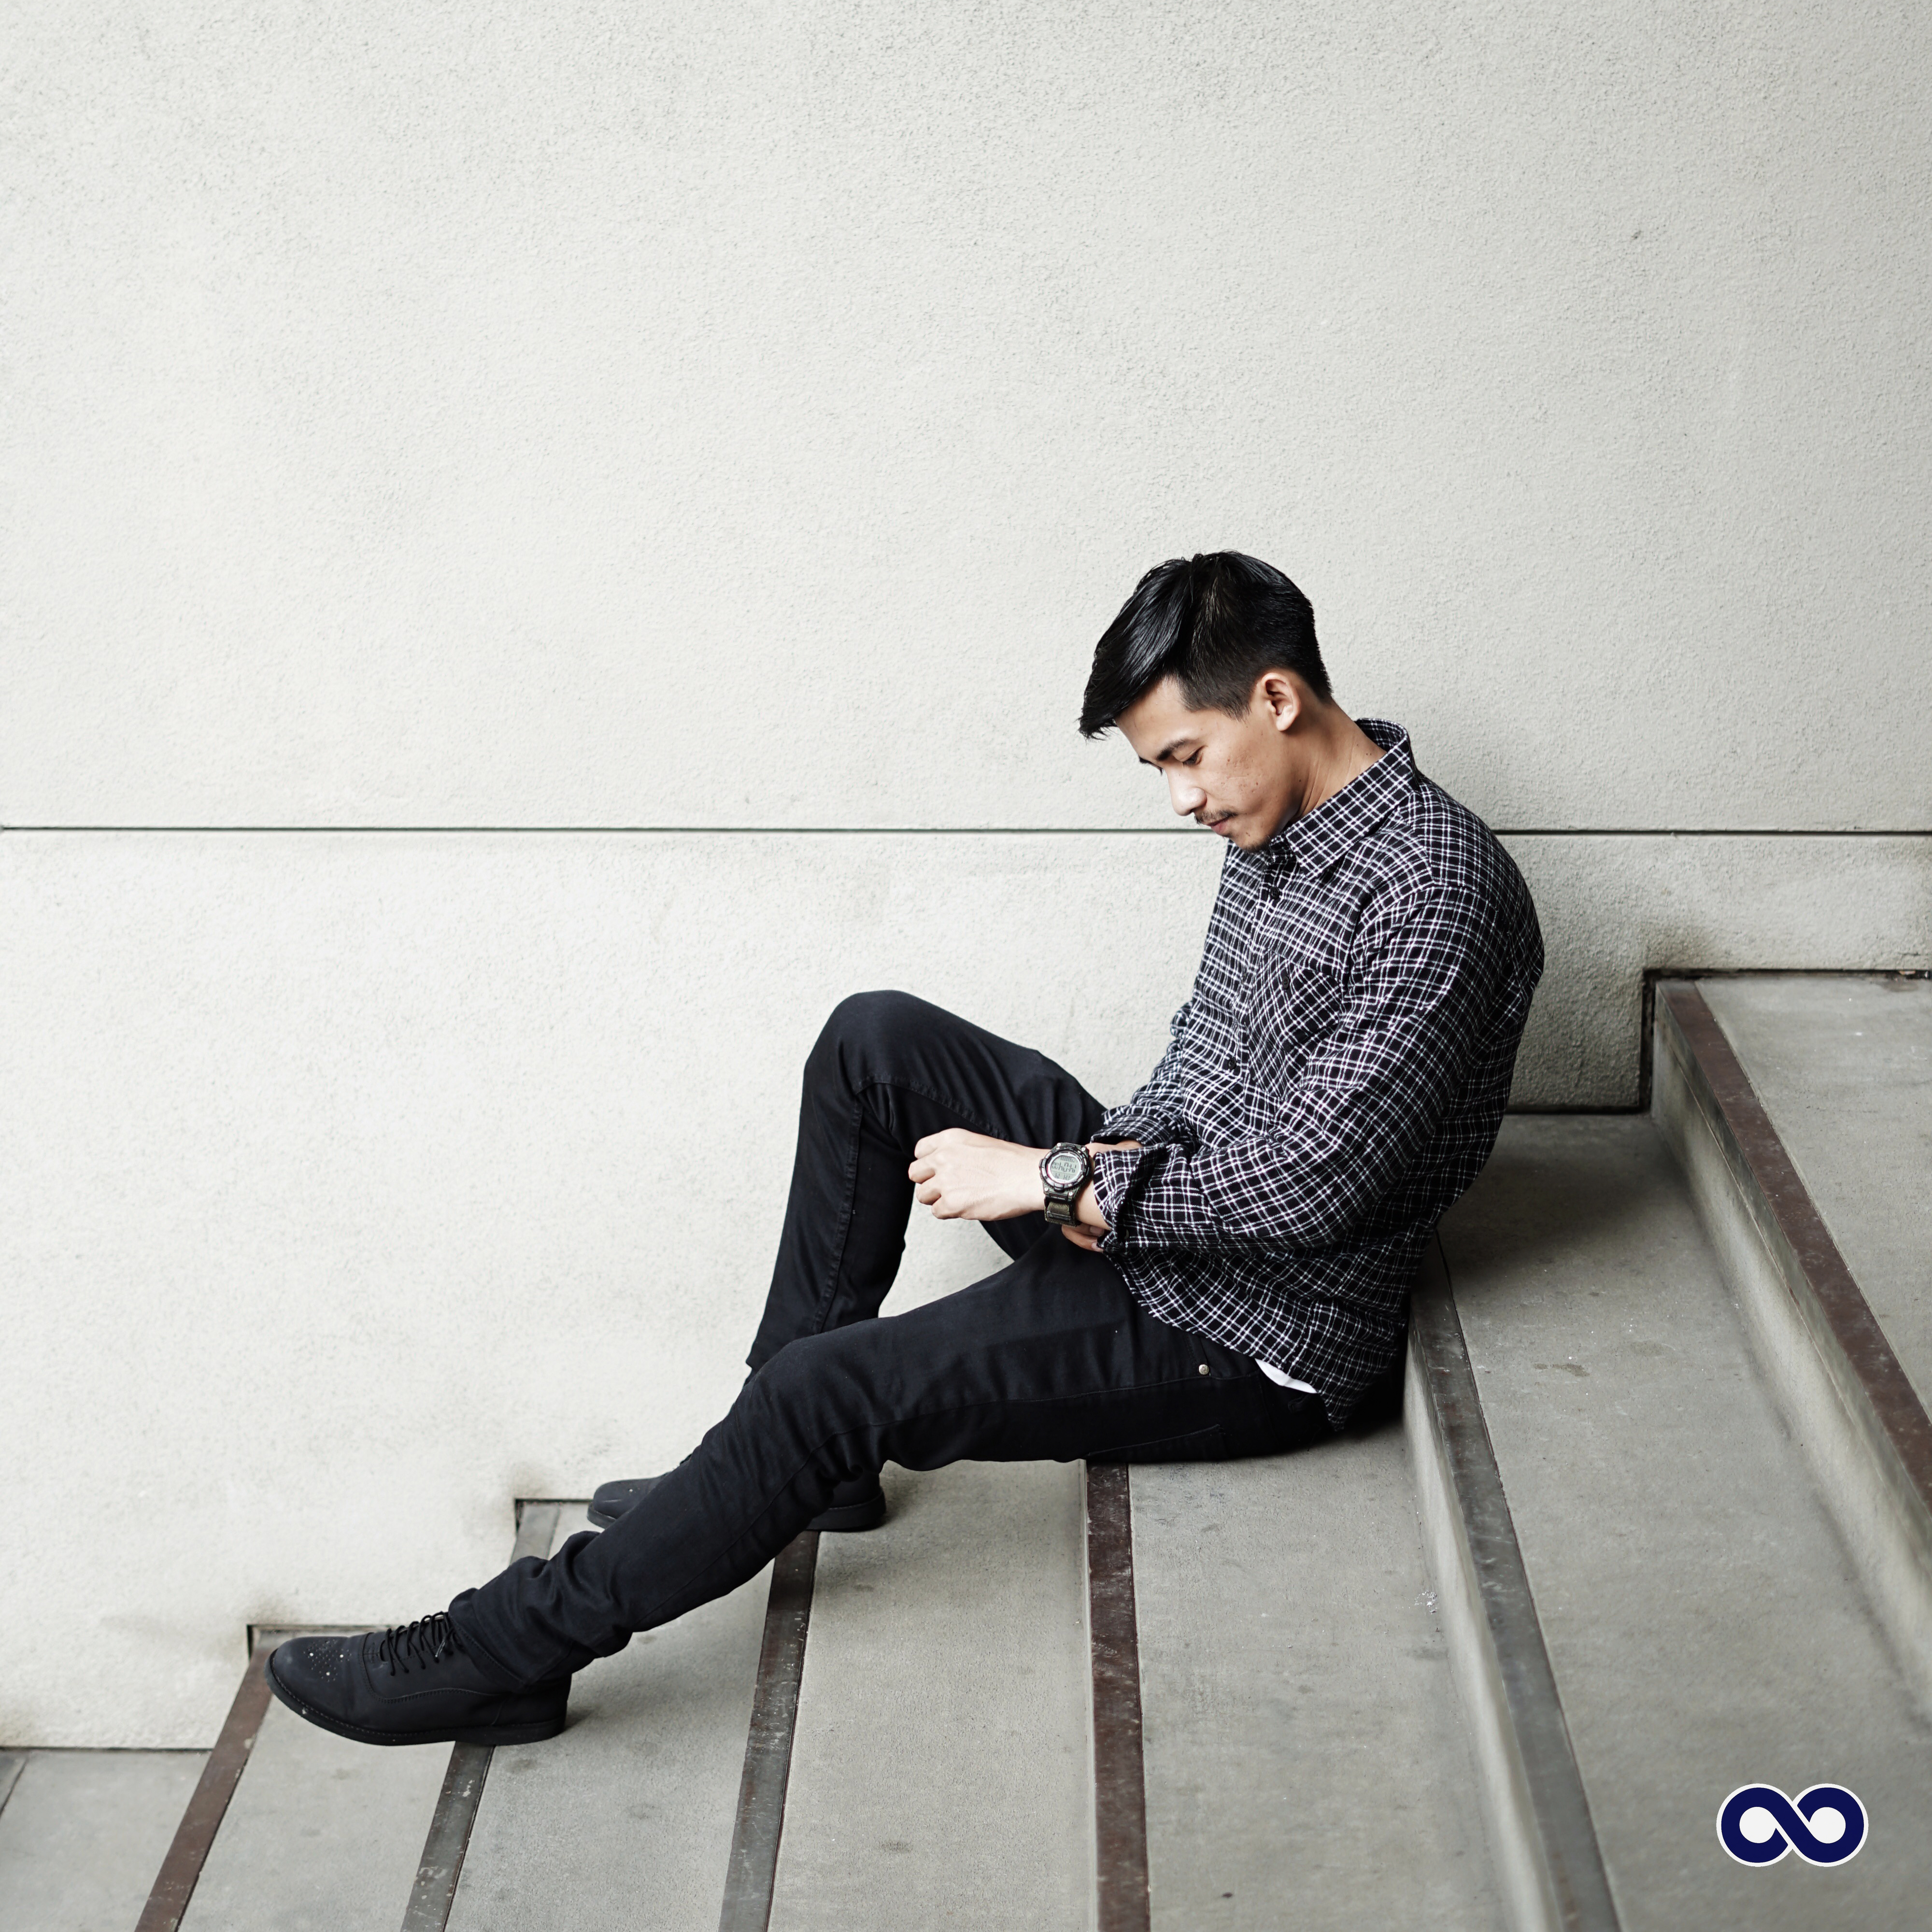 Broodis dan Awal Mula Fokus Fashion Pria image